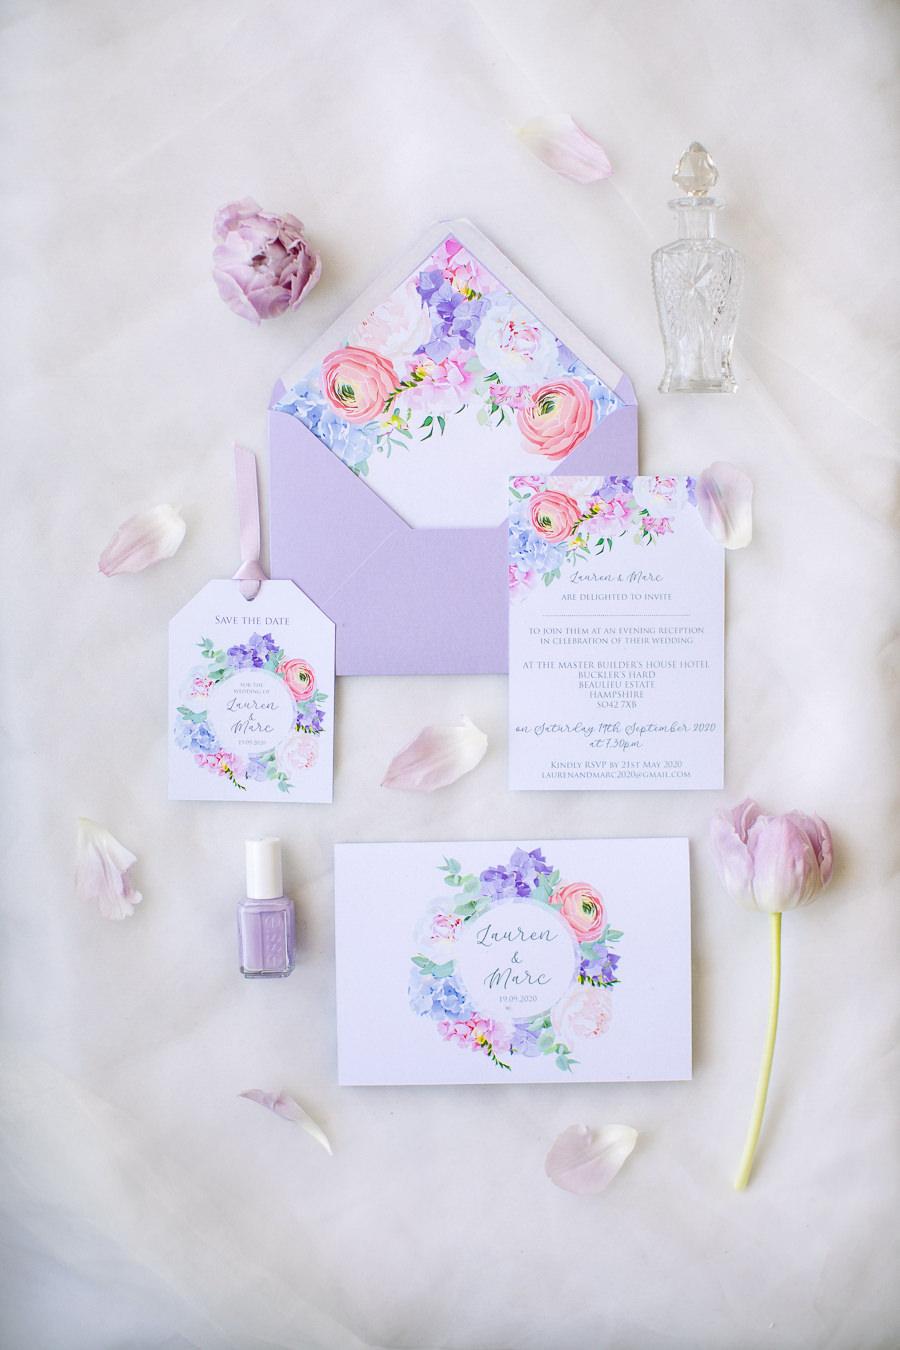 'Understated Elegance' Spring Styled Hampshire Bridal Shoot – Rownhams House, photo credit Nisha Haq Photography (30)